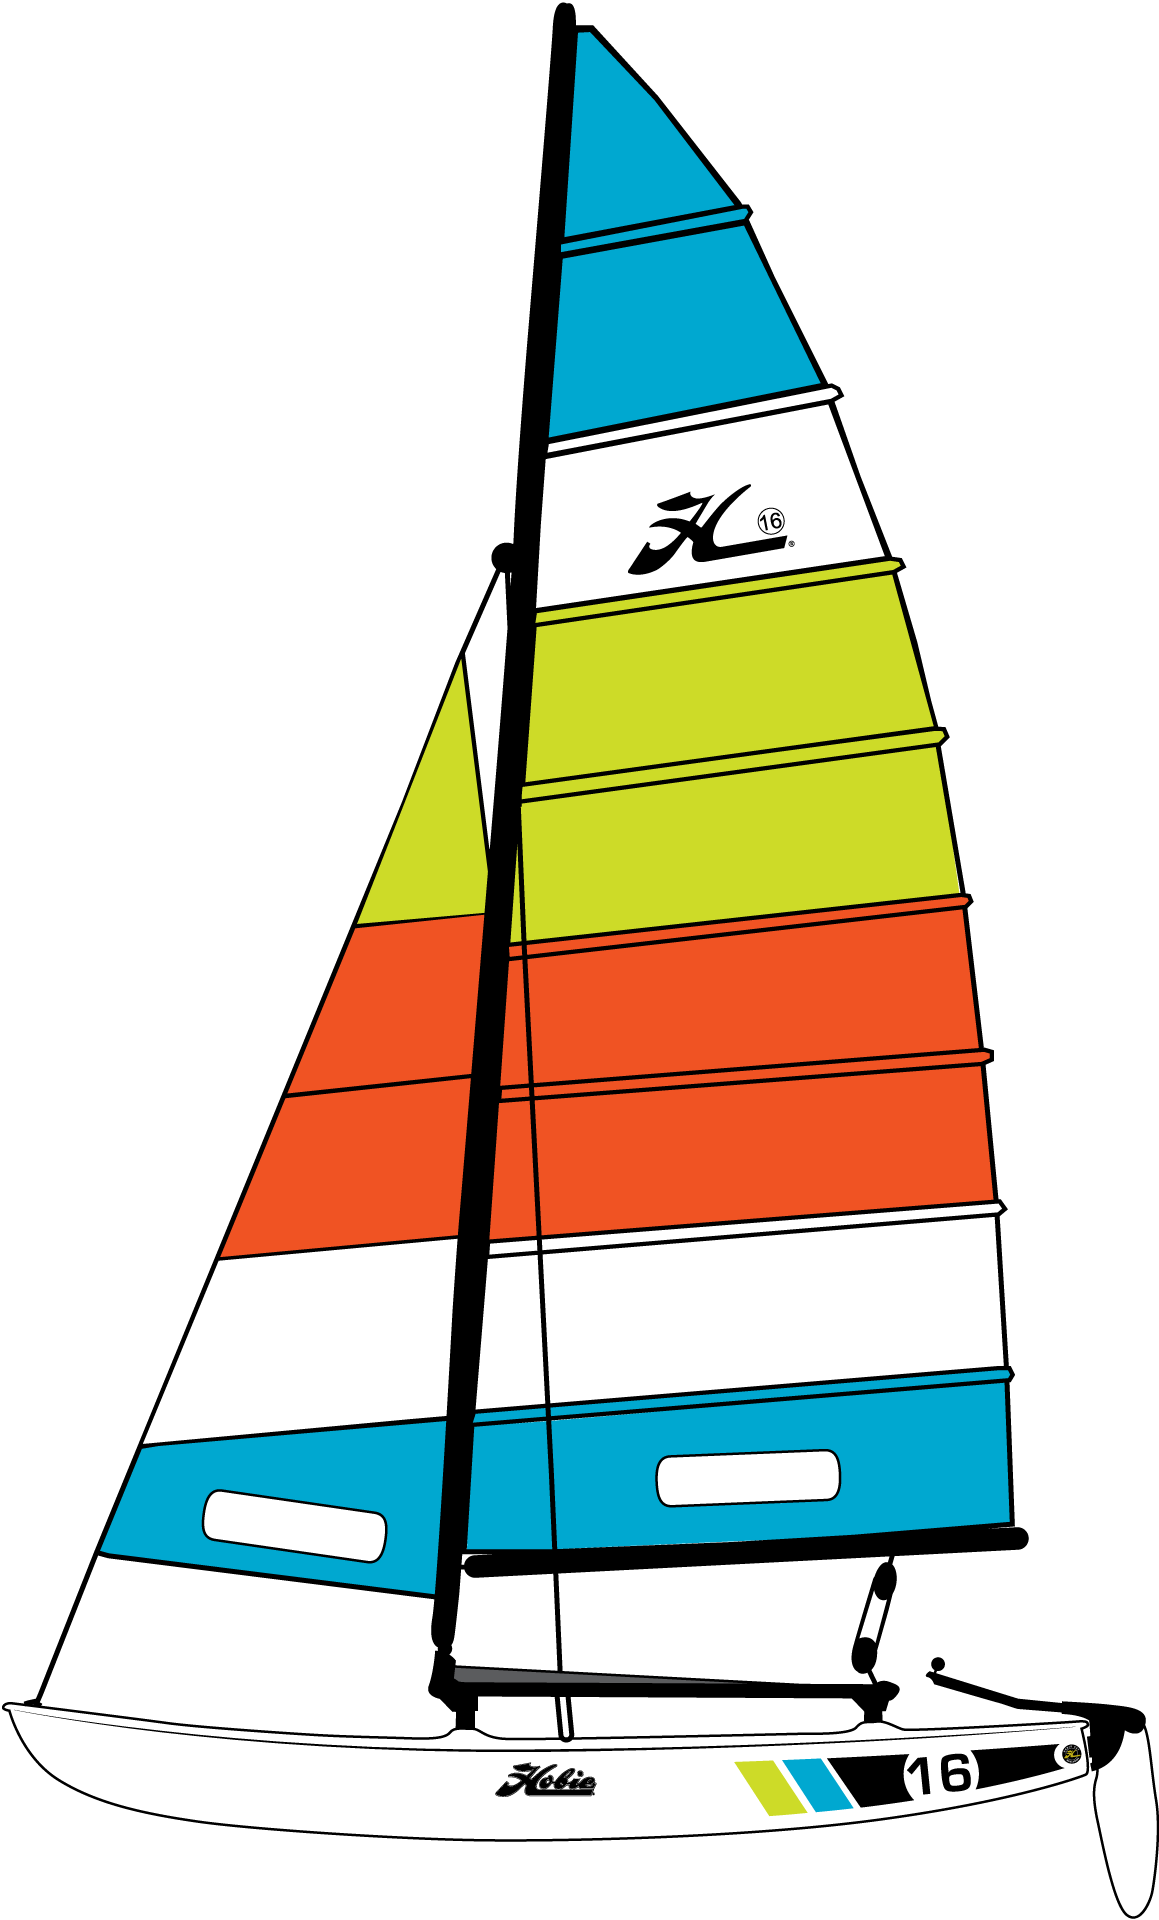 Hobie support . Clipart wave sailboat